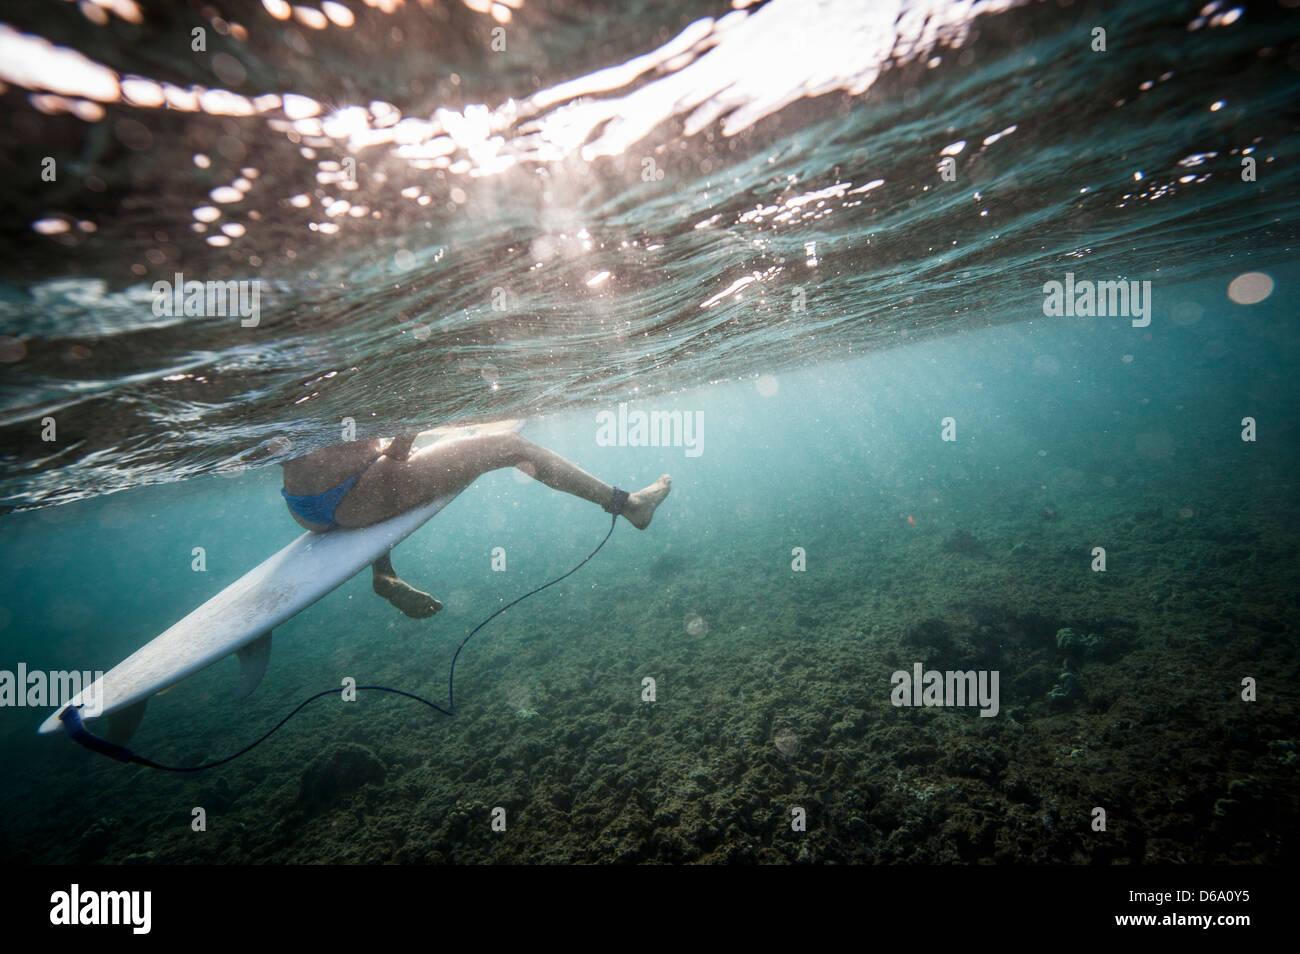 Surfer im Wasser an Bord sitzen Stockbild